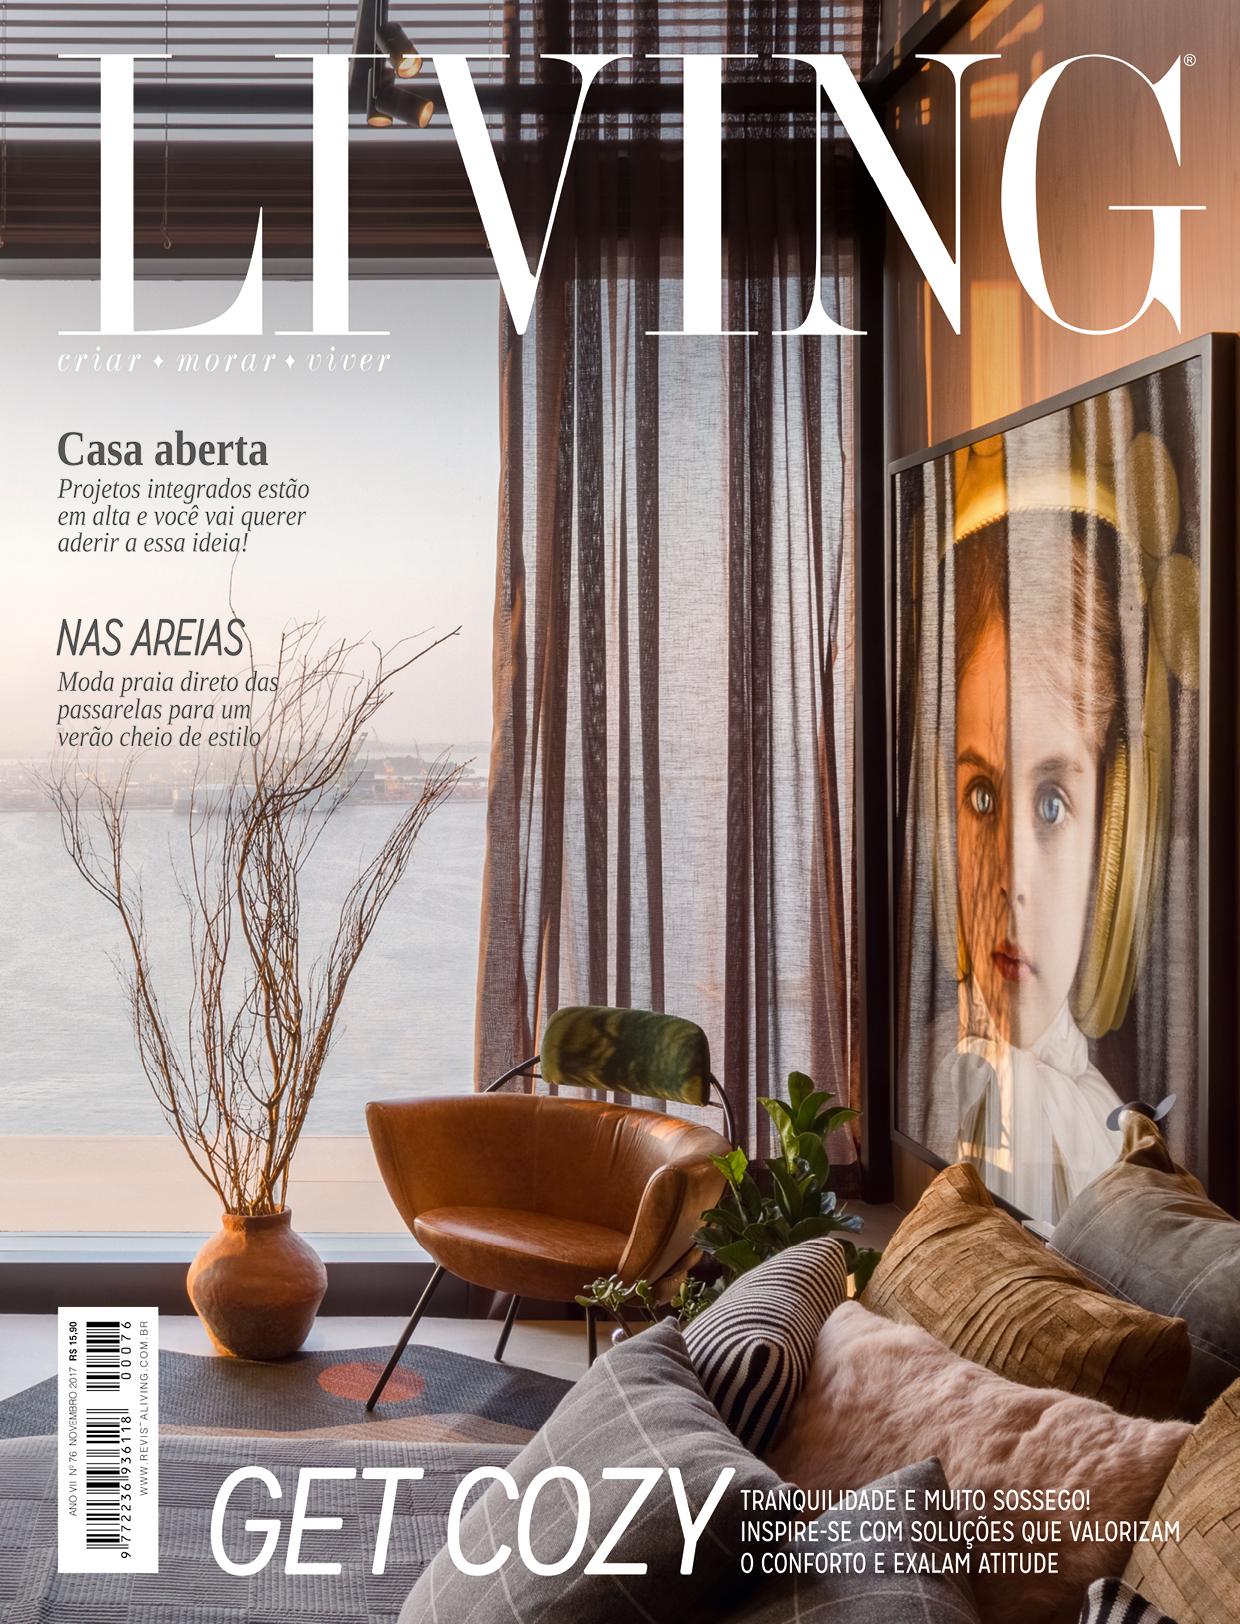 Living (Spain) - Push/Pull